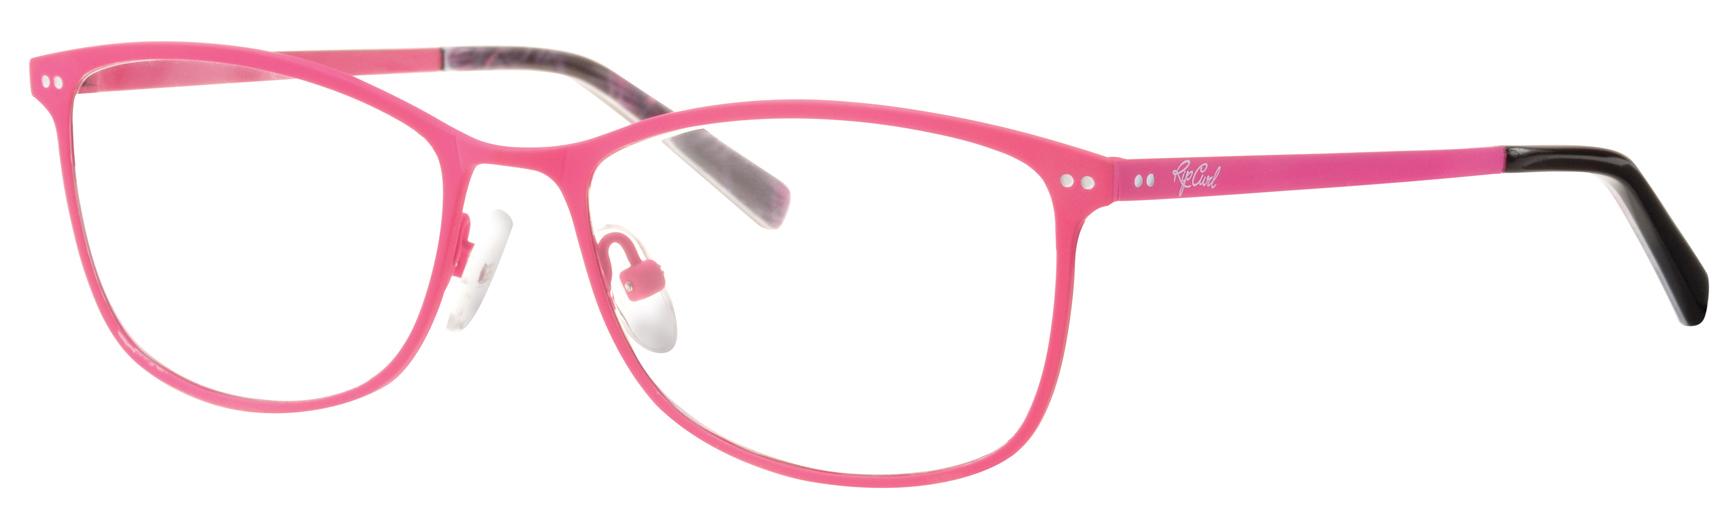 Frames - Optical Service